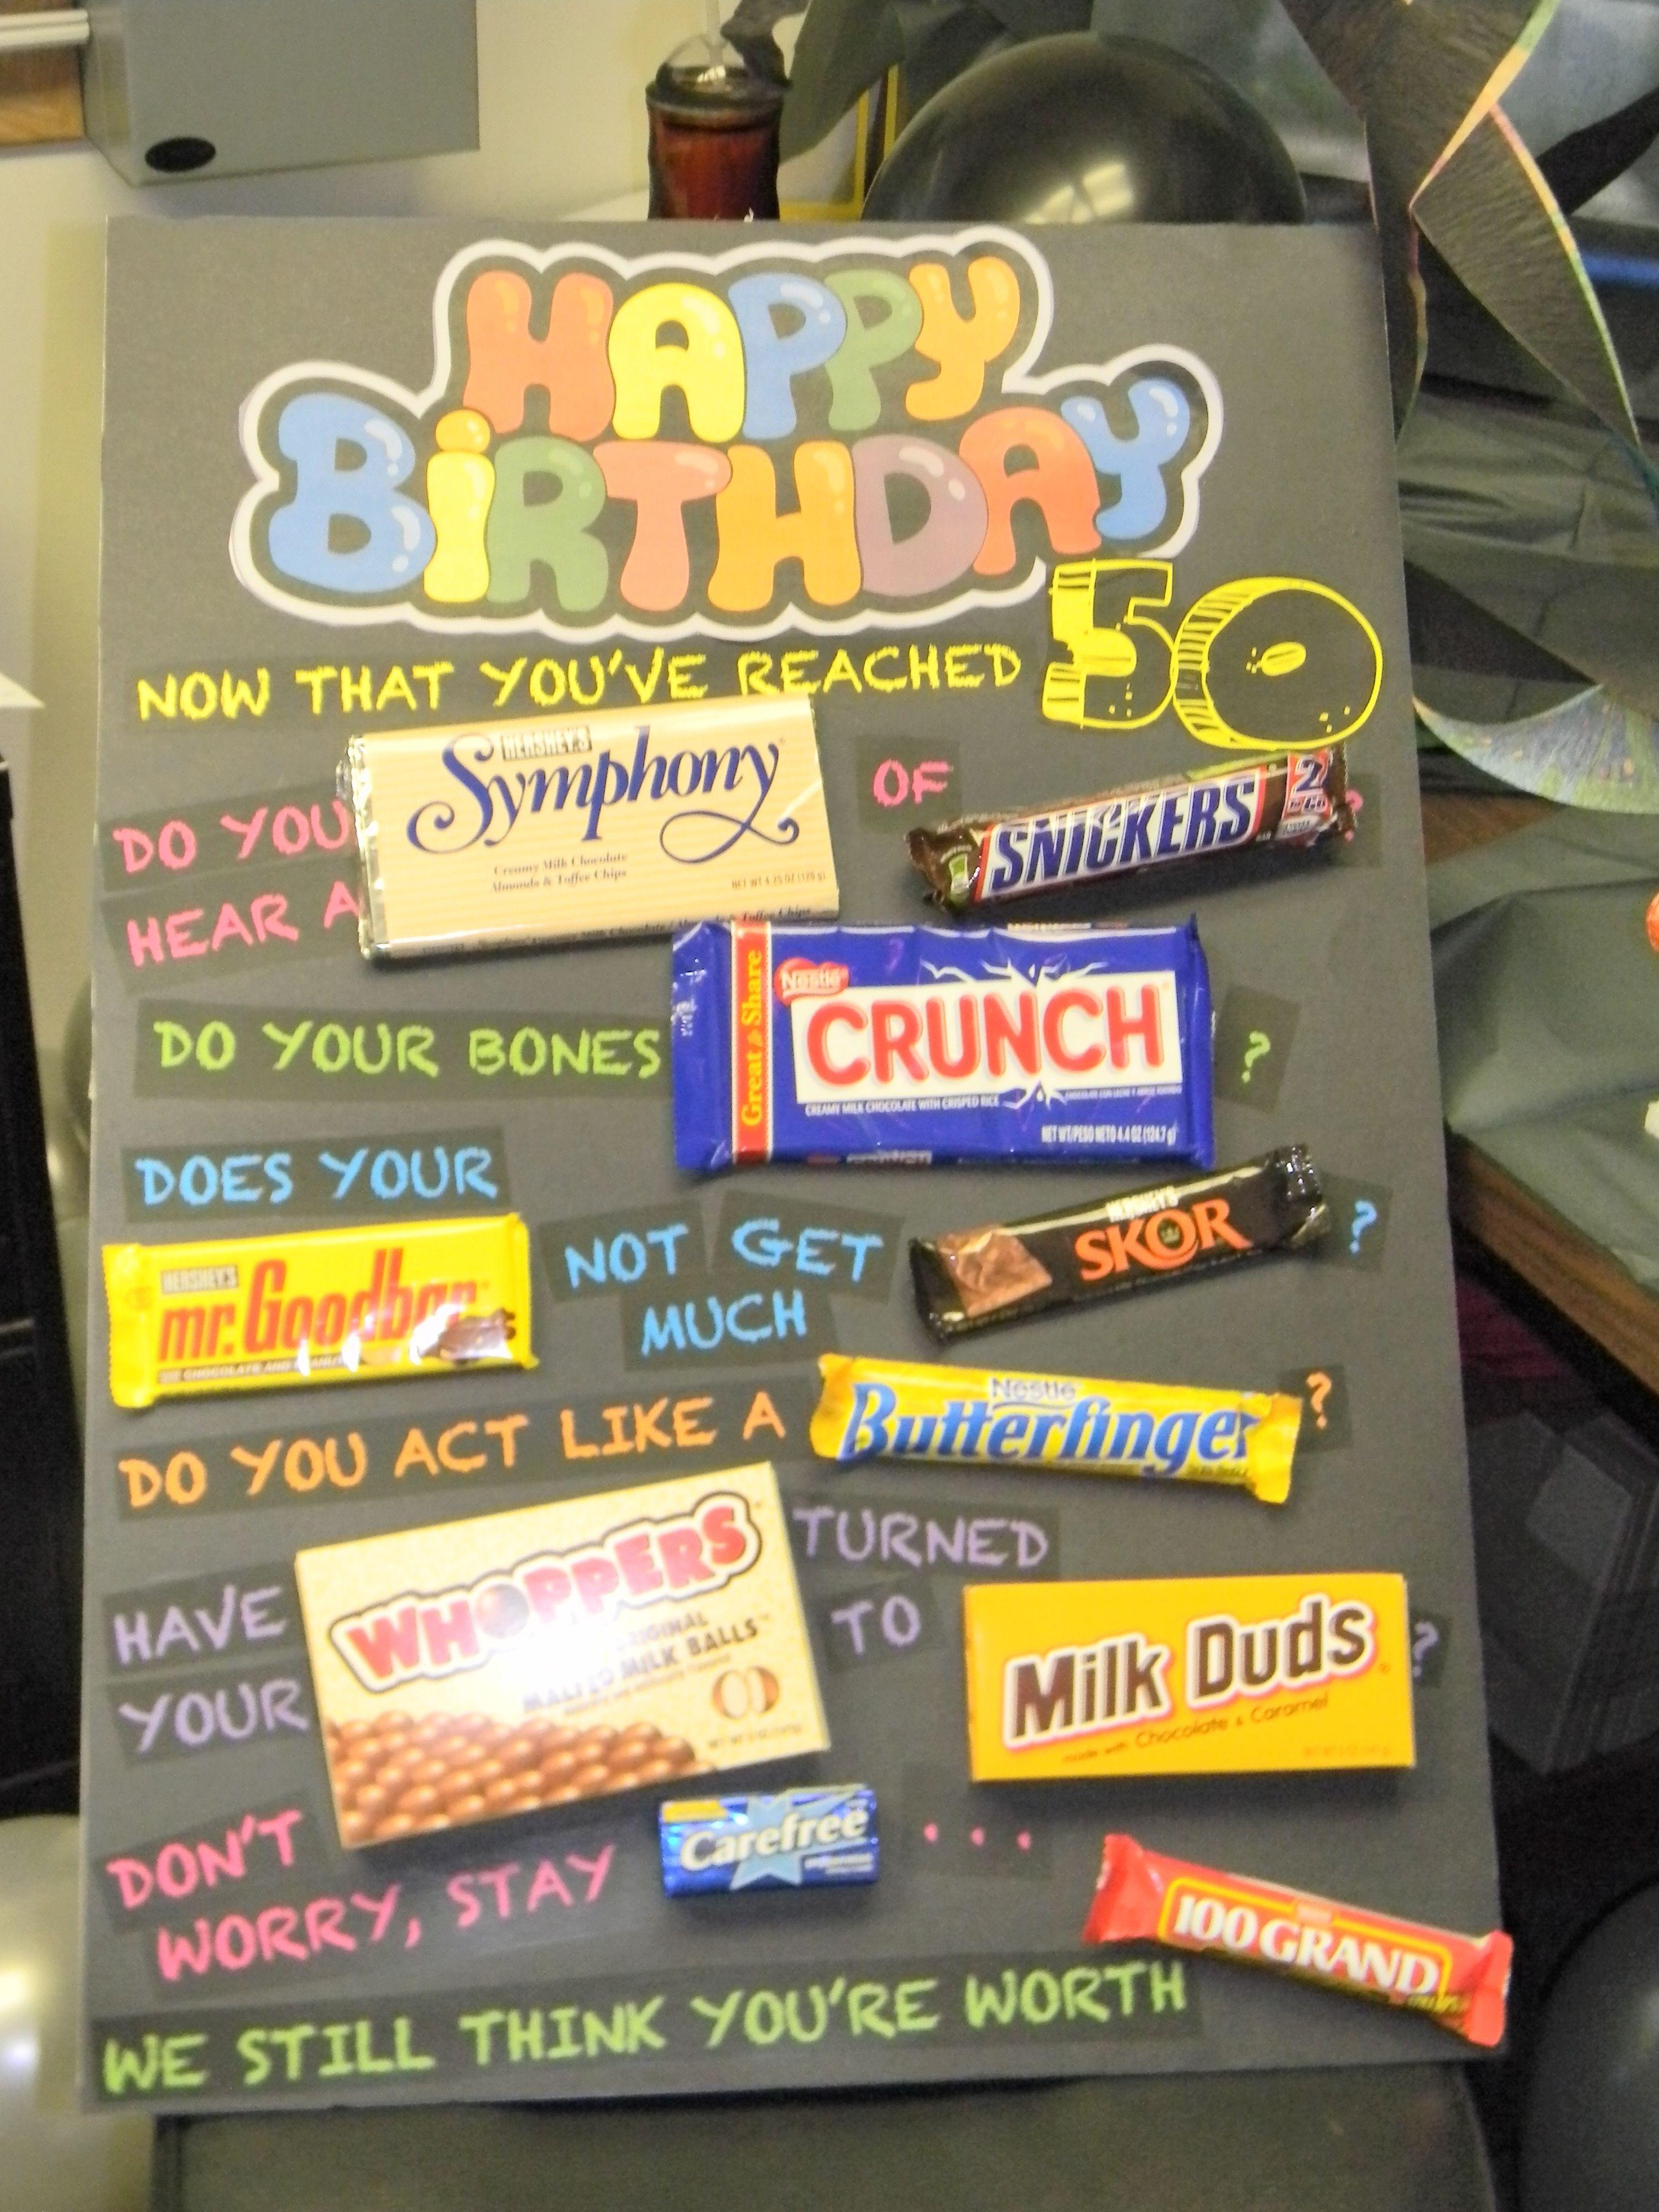 10 Best Funny 60th Birthday Gifts Ideas 60th Birthday Birthday Gifts 60th Birthday Gifts